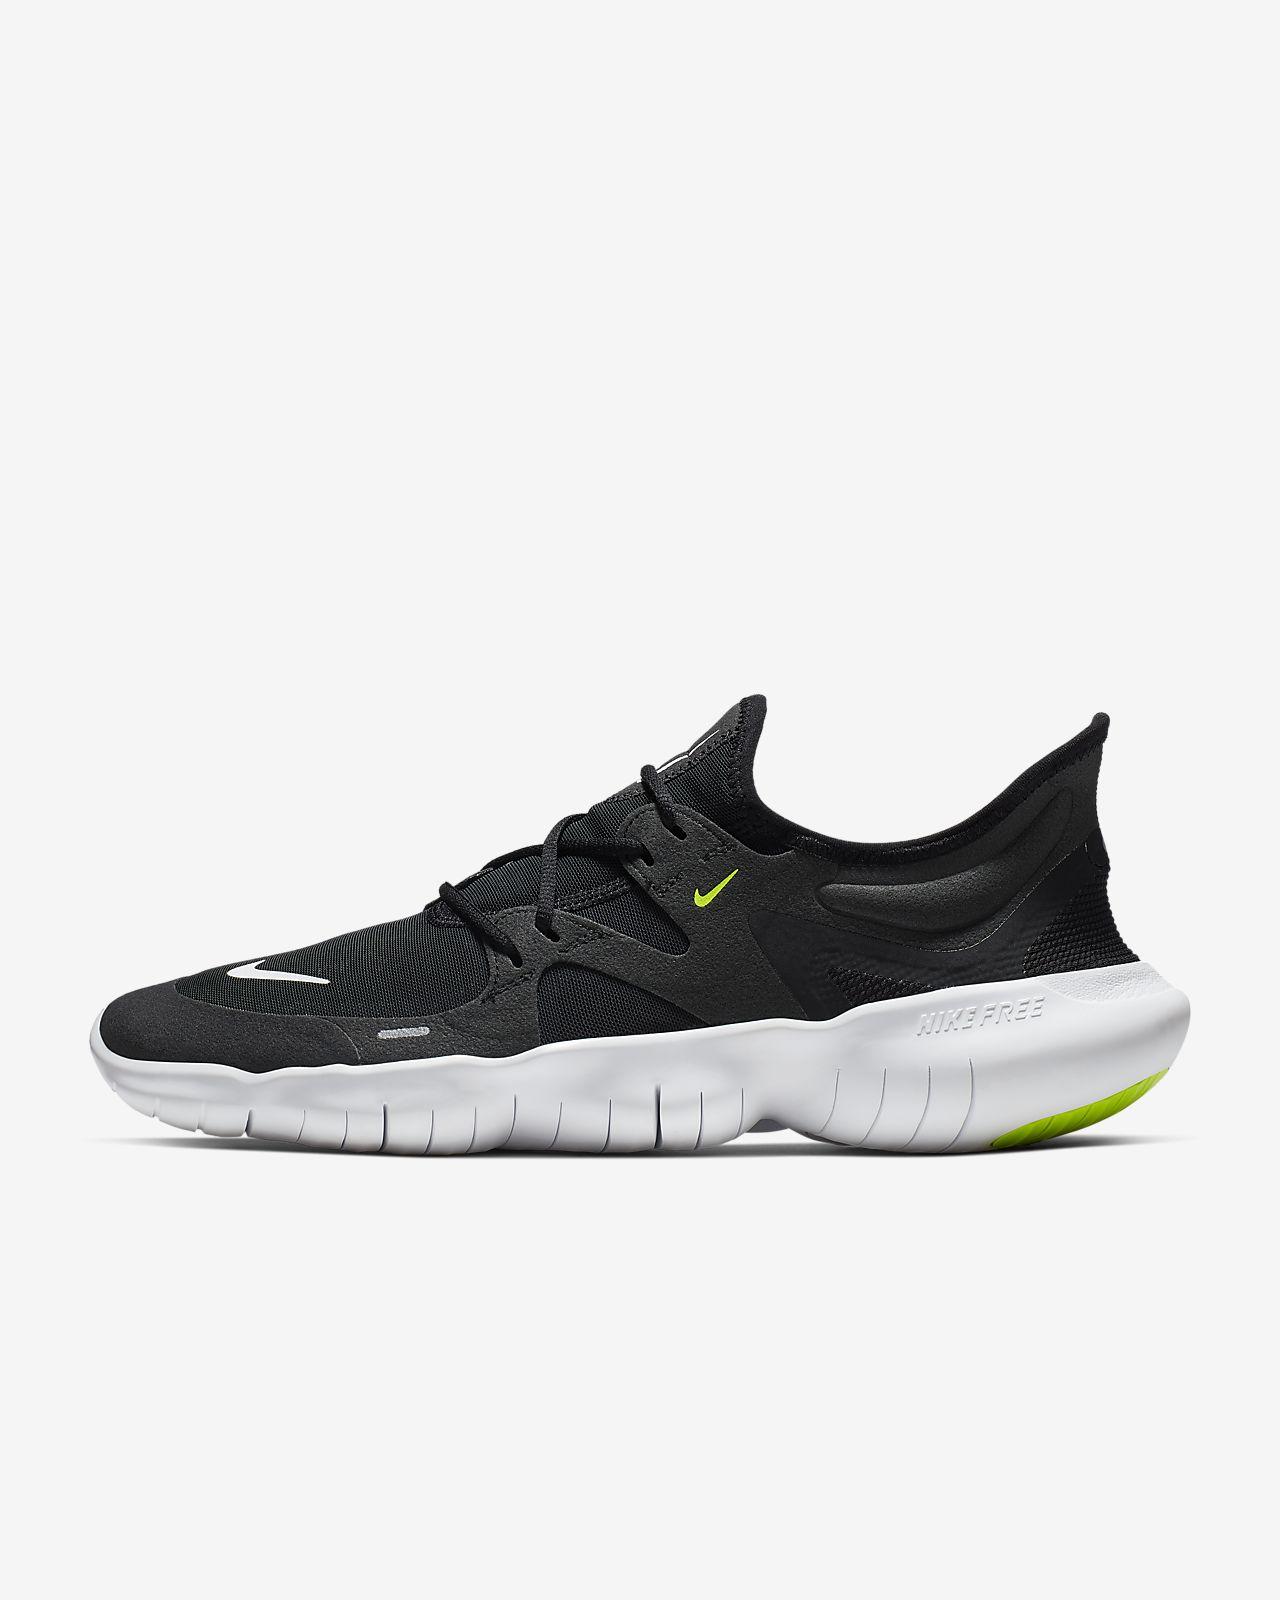 Nike Free Run 3 Womens : Nike Free 5.0